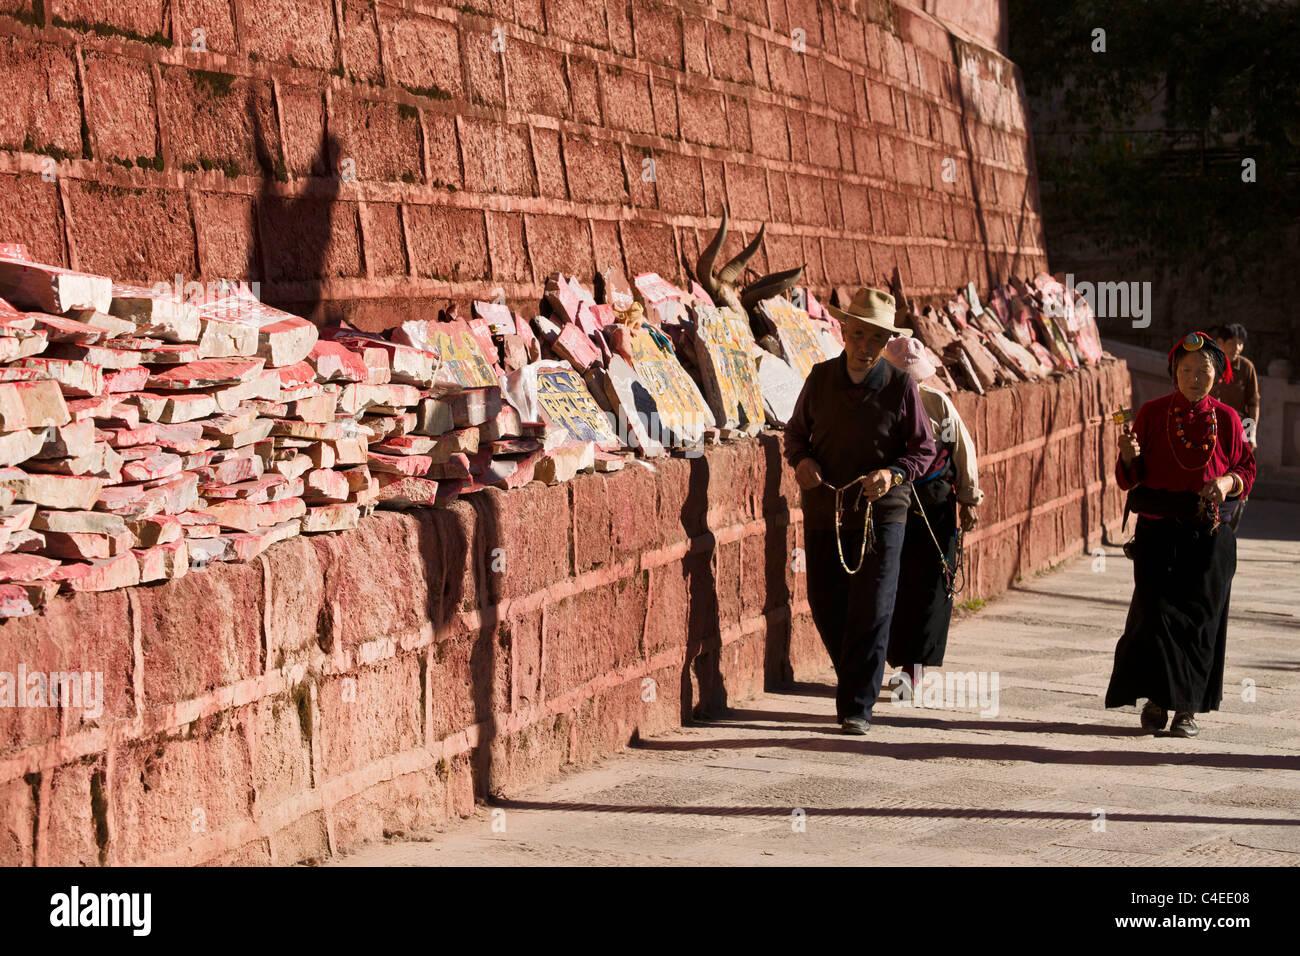 Tibetan pilgrims circumnambulating around Dege Scripture Printing House, Dege, Sichuan, China - Stock Image